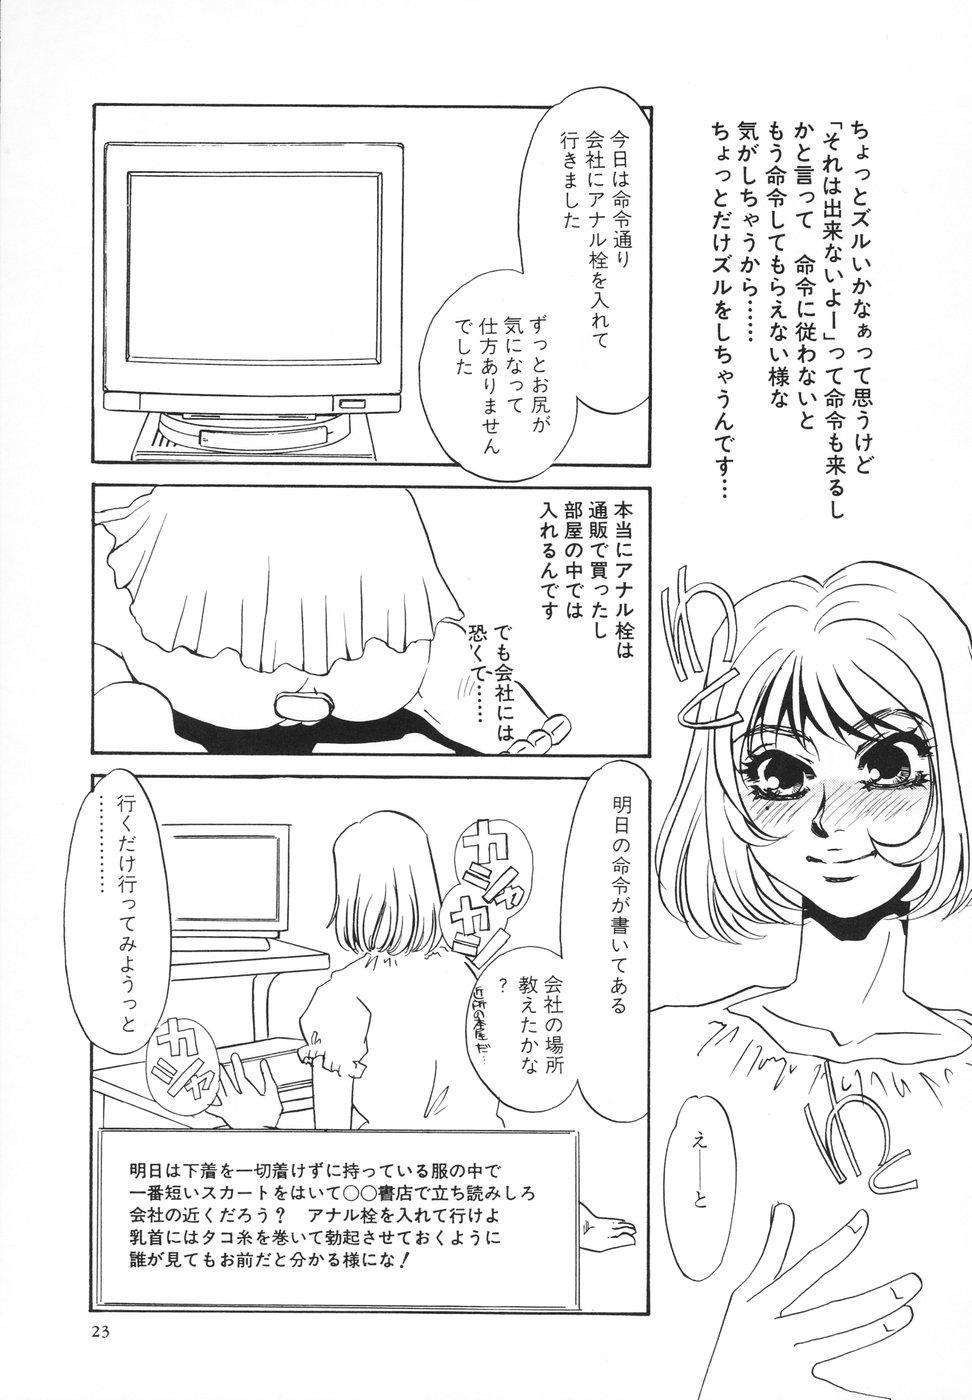 Hentai Inran 23